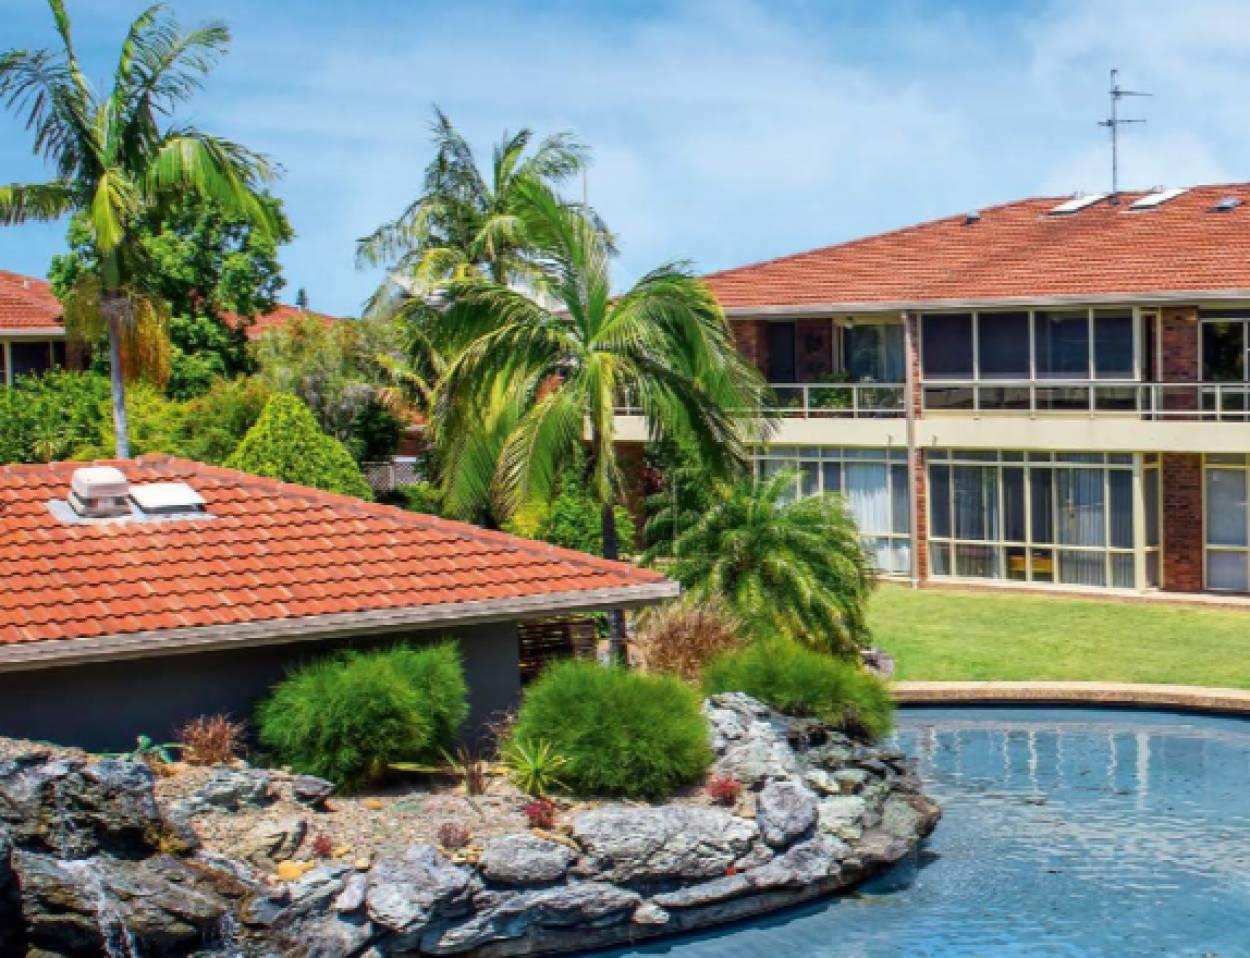 The Governor's Retirement Resort 166  River Park Road - Port Macquarie 2444 Retirement Property for Sale